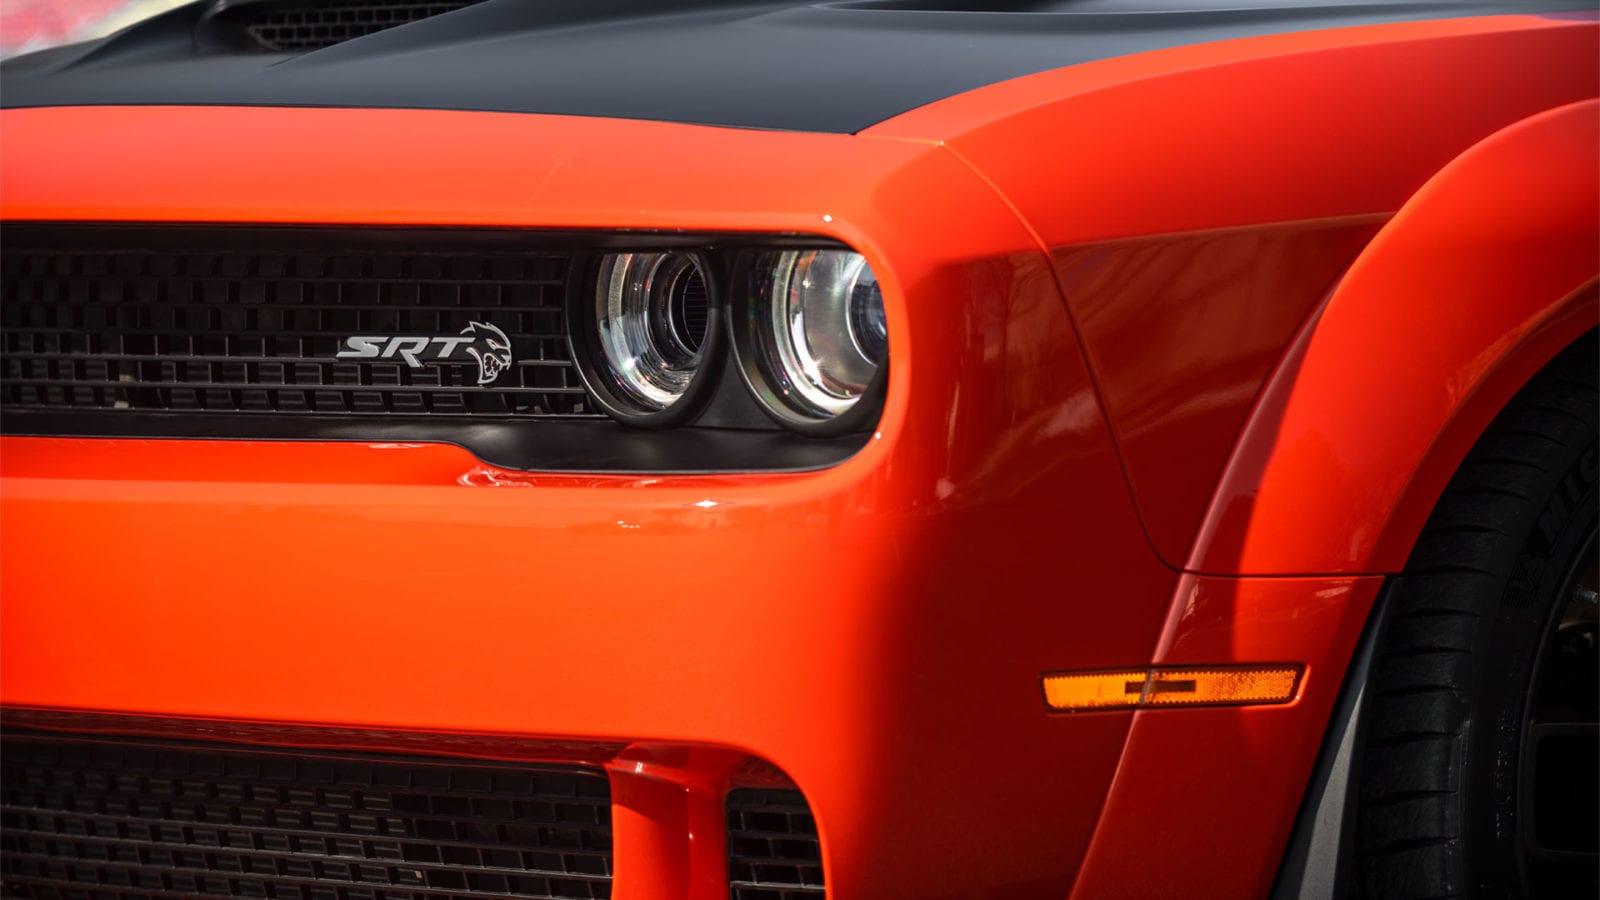 Dodge Hellcat Widebody head lights